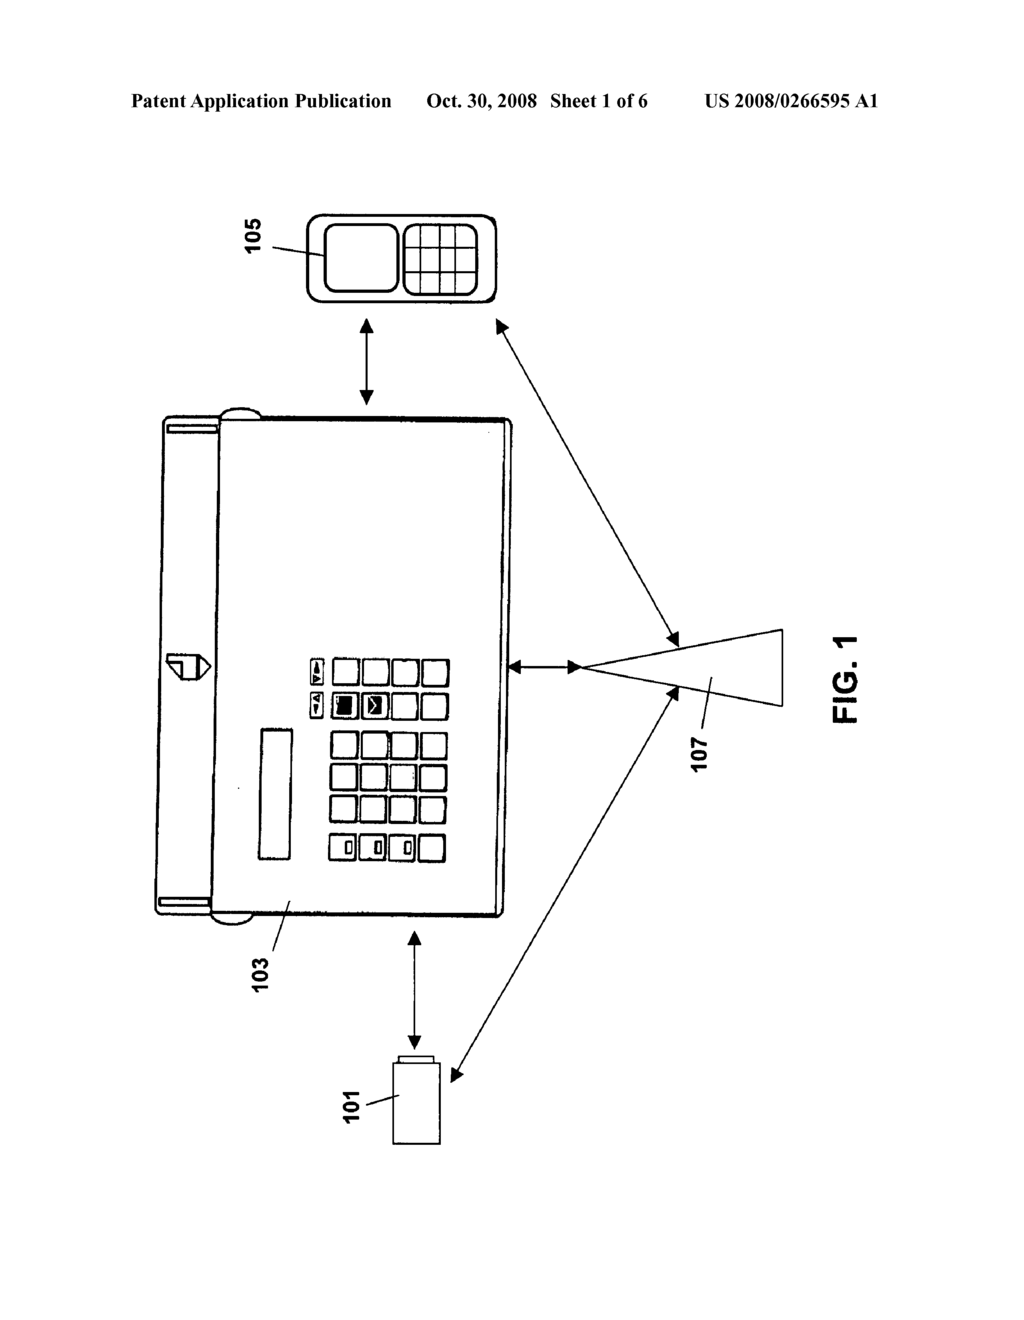 Fax Machine Wiring Diagram - vending machine wiring diagram